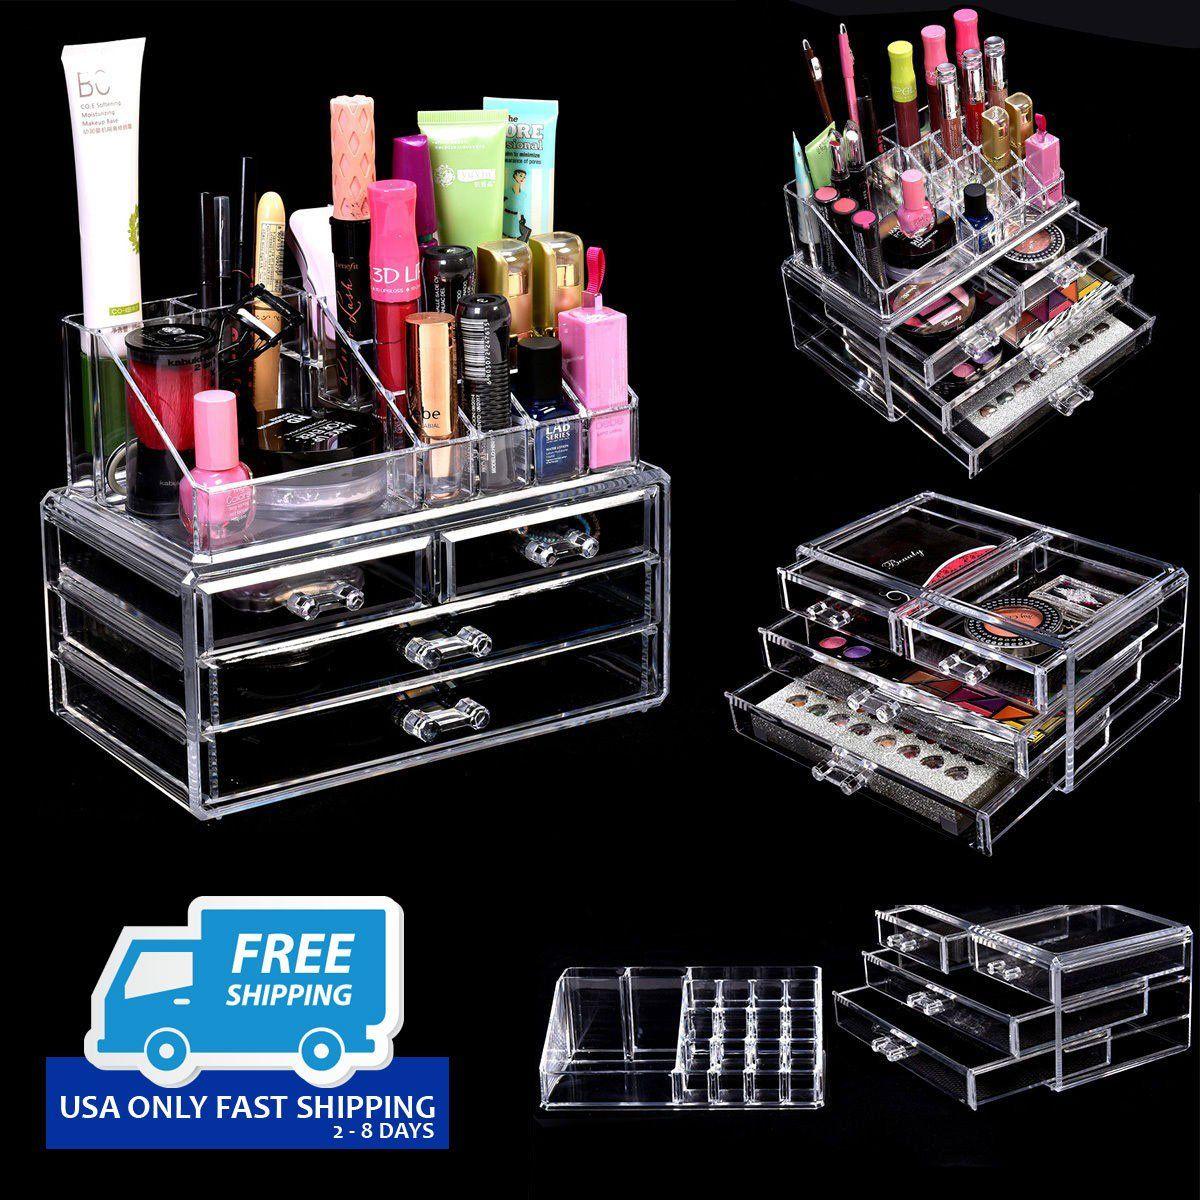 Acrylic Makeup Cosmetic Organizer 4 Drawers Jewelry Storage Display